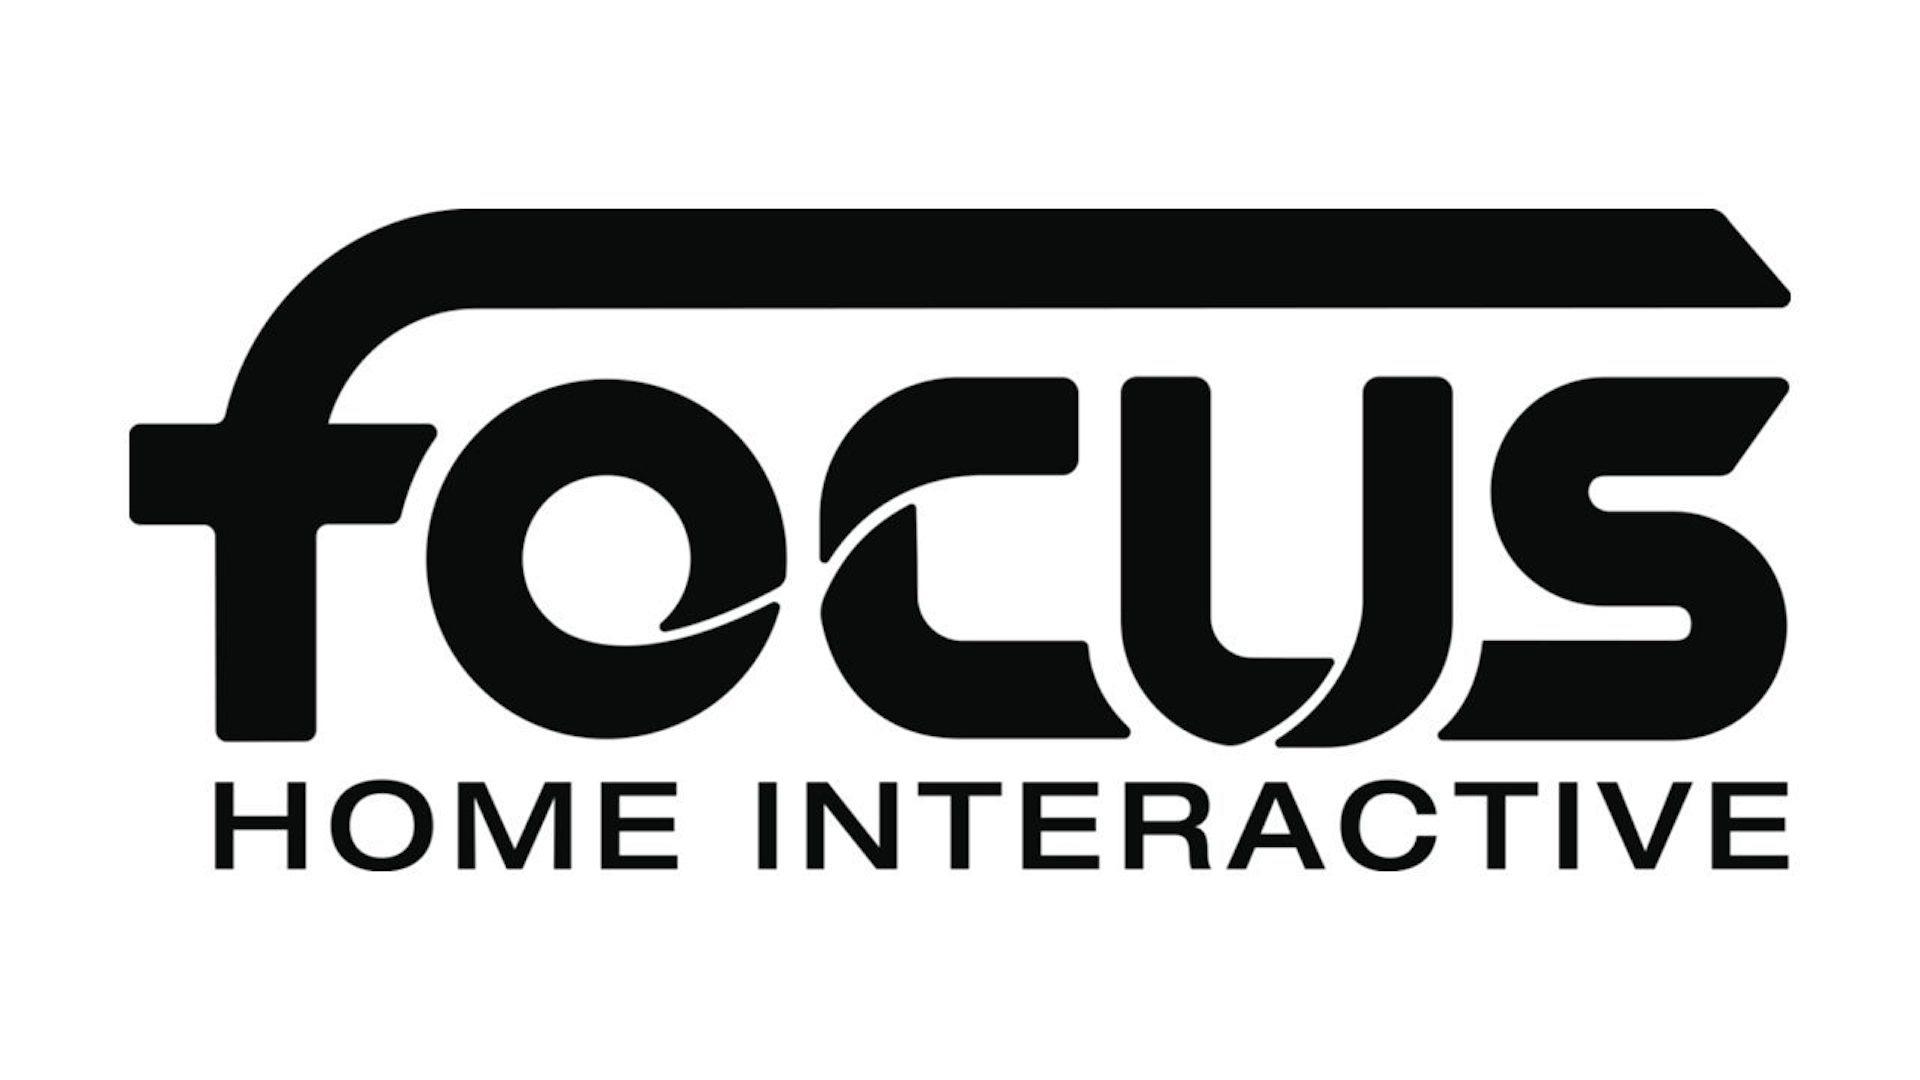 Aeon Must Die! Limestone Games Focus Home Interactive wallpaper logo